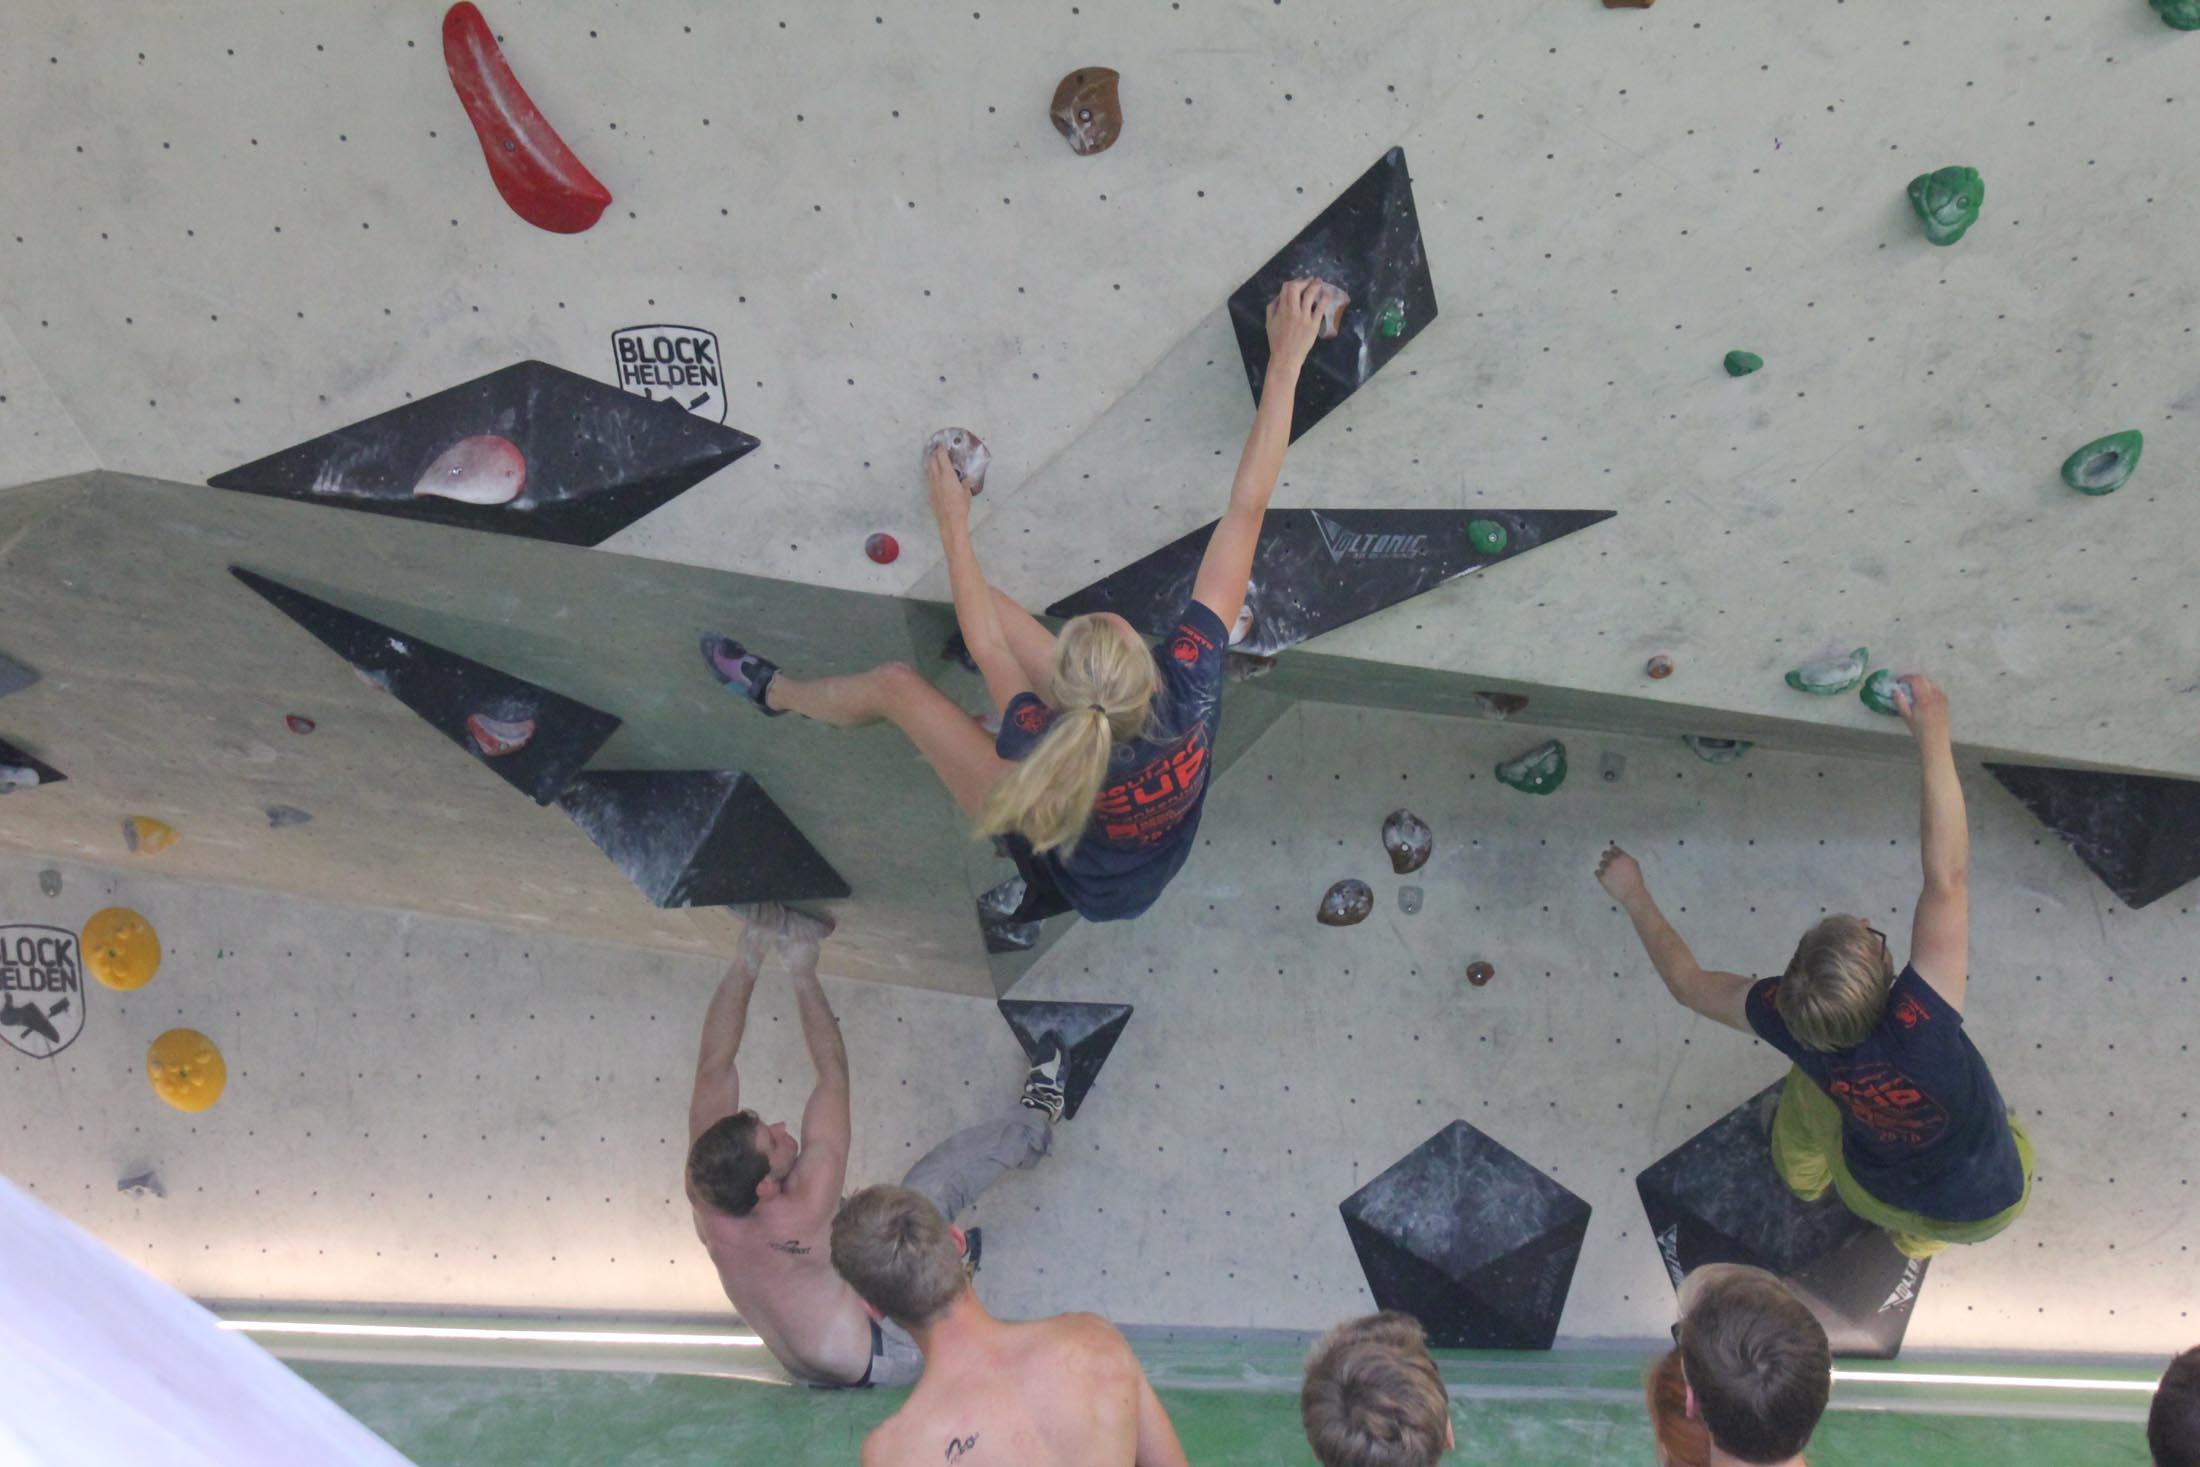 Quali, internationaler bouldercup Frankenjura 2016, BLOCKHELDEN Erlangen, Mammut, Bergfreunde.de, Boulderwettkampf07092016277